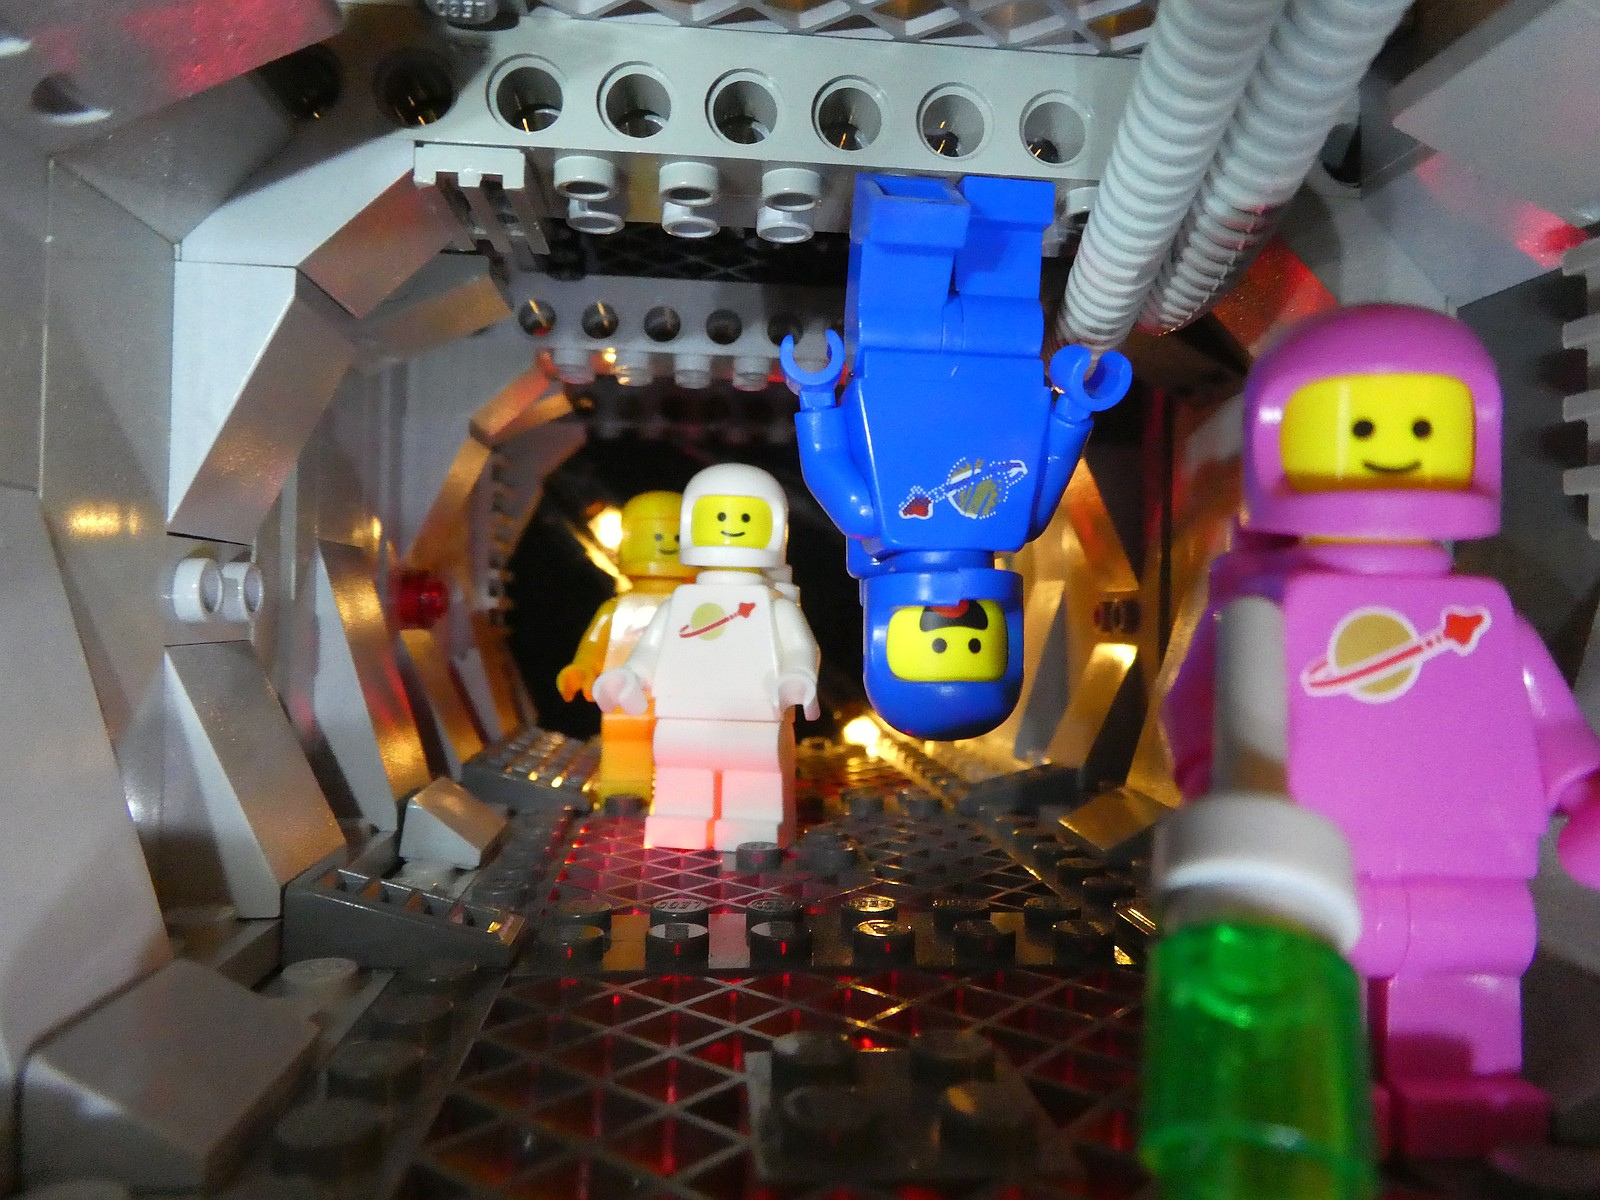 LEGOSpacemen